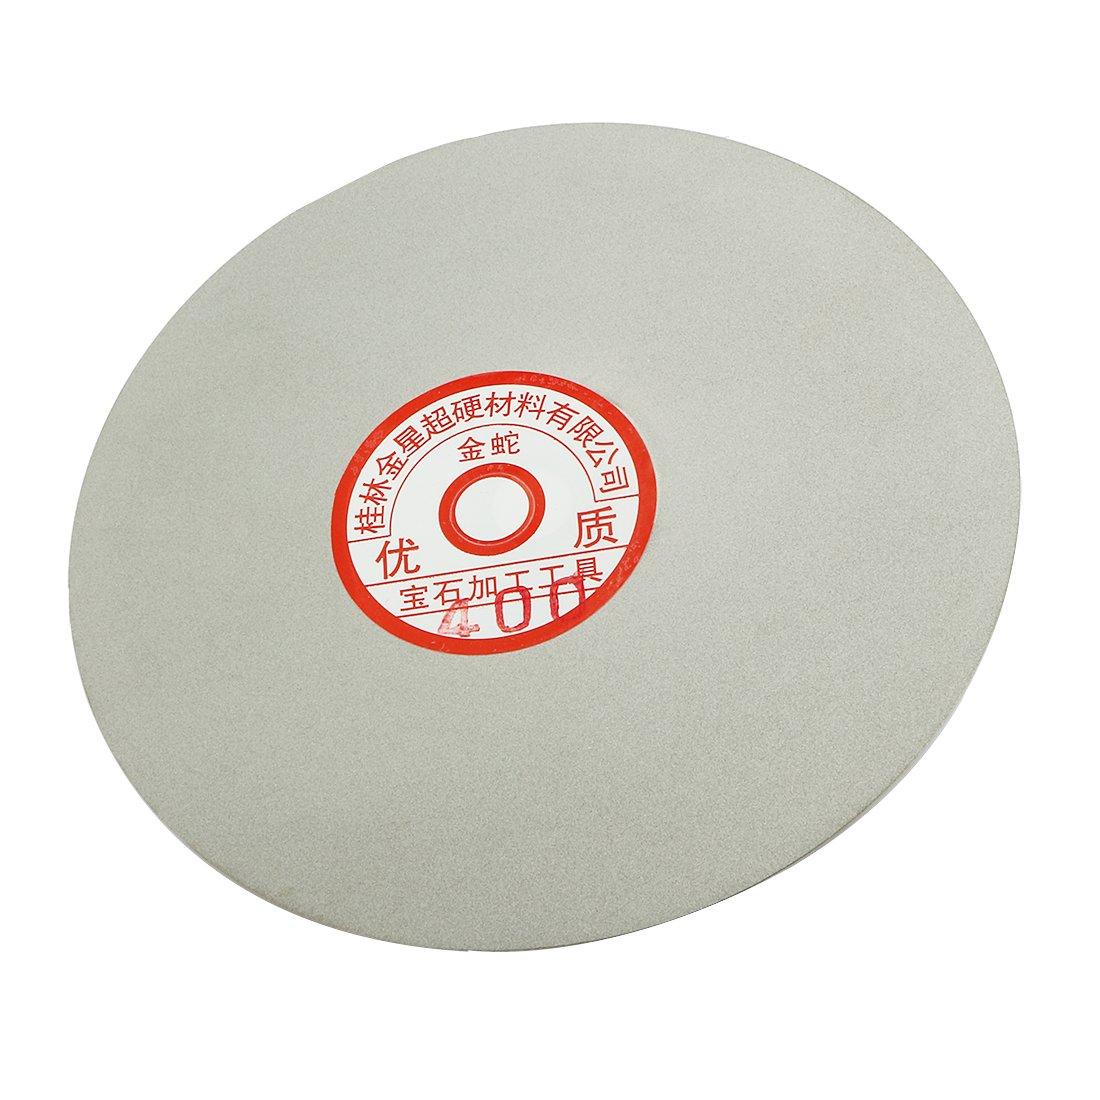 uxcell/® 6-inch Grit 46 Diamond Coated Flat Lap Wheel Grinding Sanding Polishing Disc